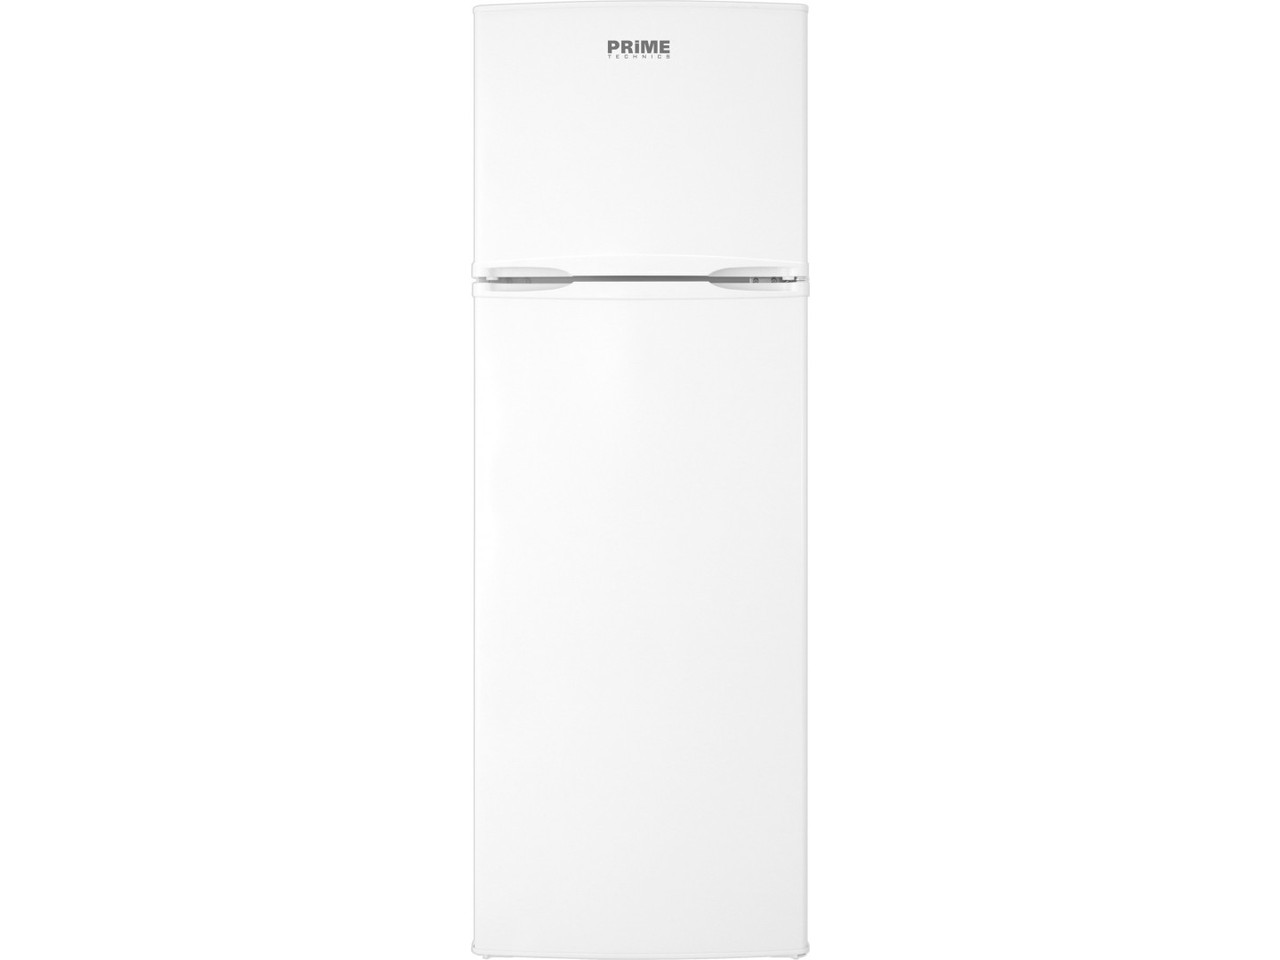 Холодильник Prime Technics RTS 1601 M